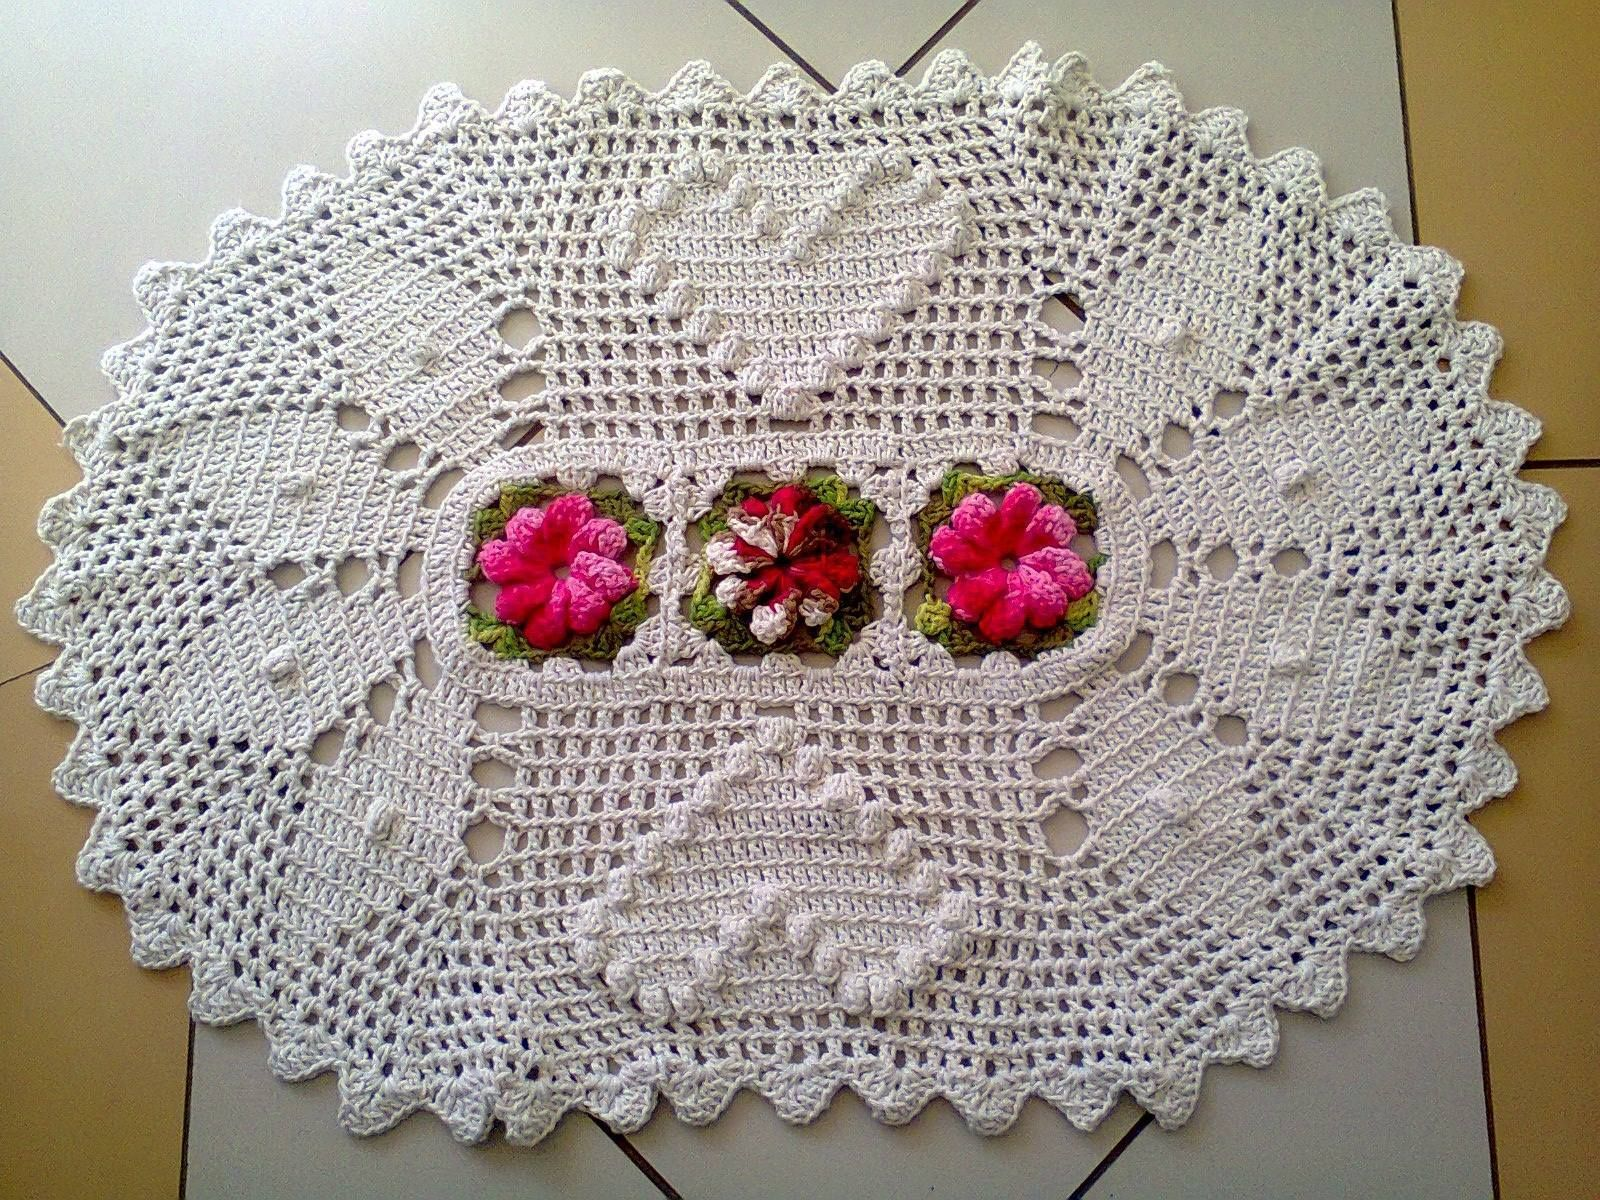 75 Modelos De Tapetes De Barbante Para Inspirar Crochet -> Tapetes Desenhos